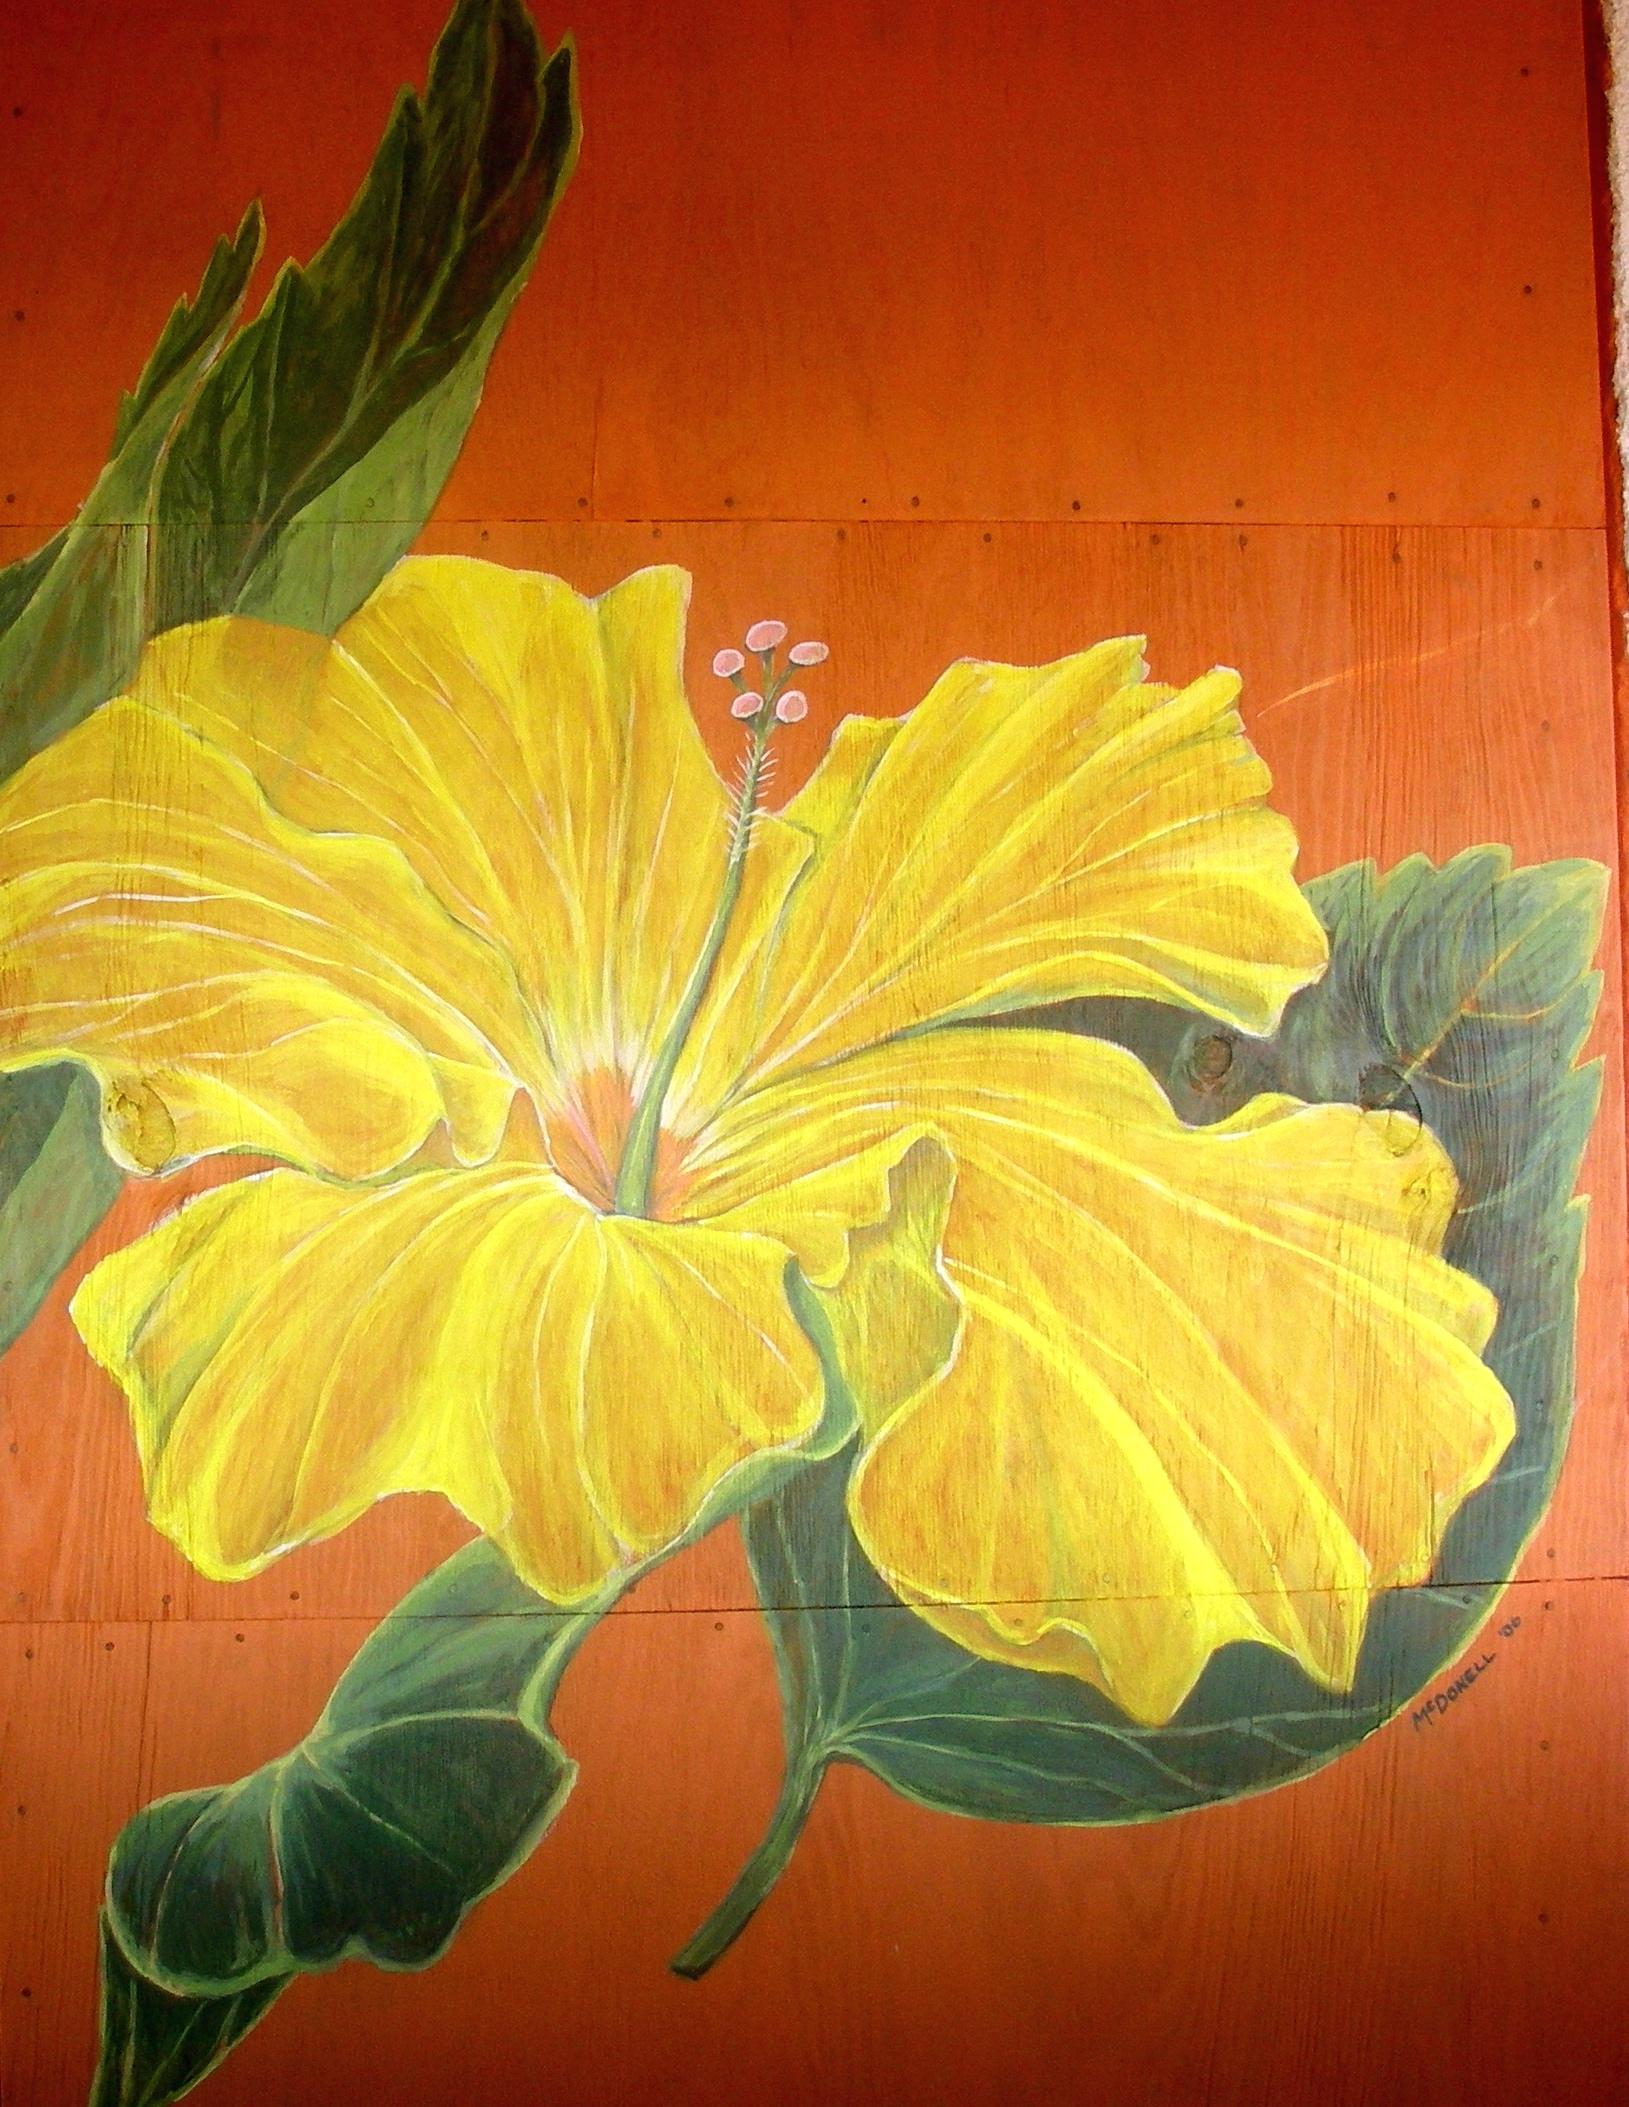 'Hibiscus at Huachinangas' (Mural)